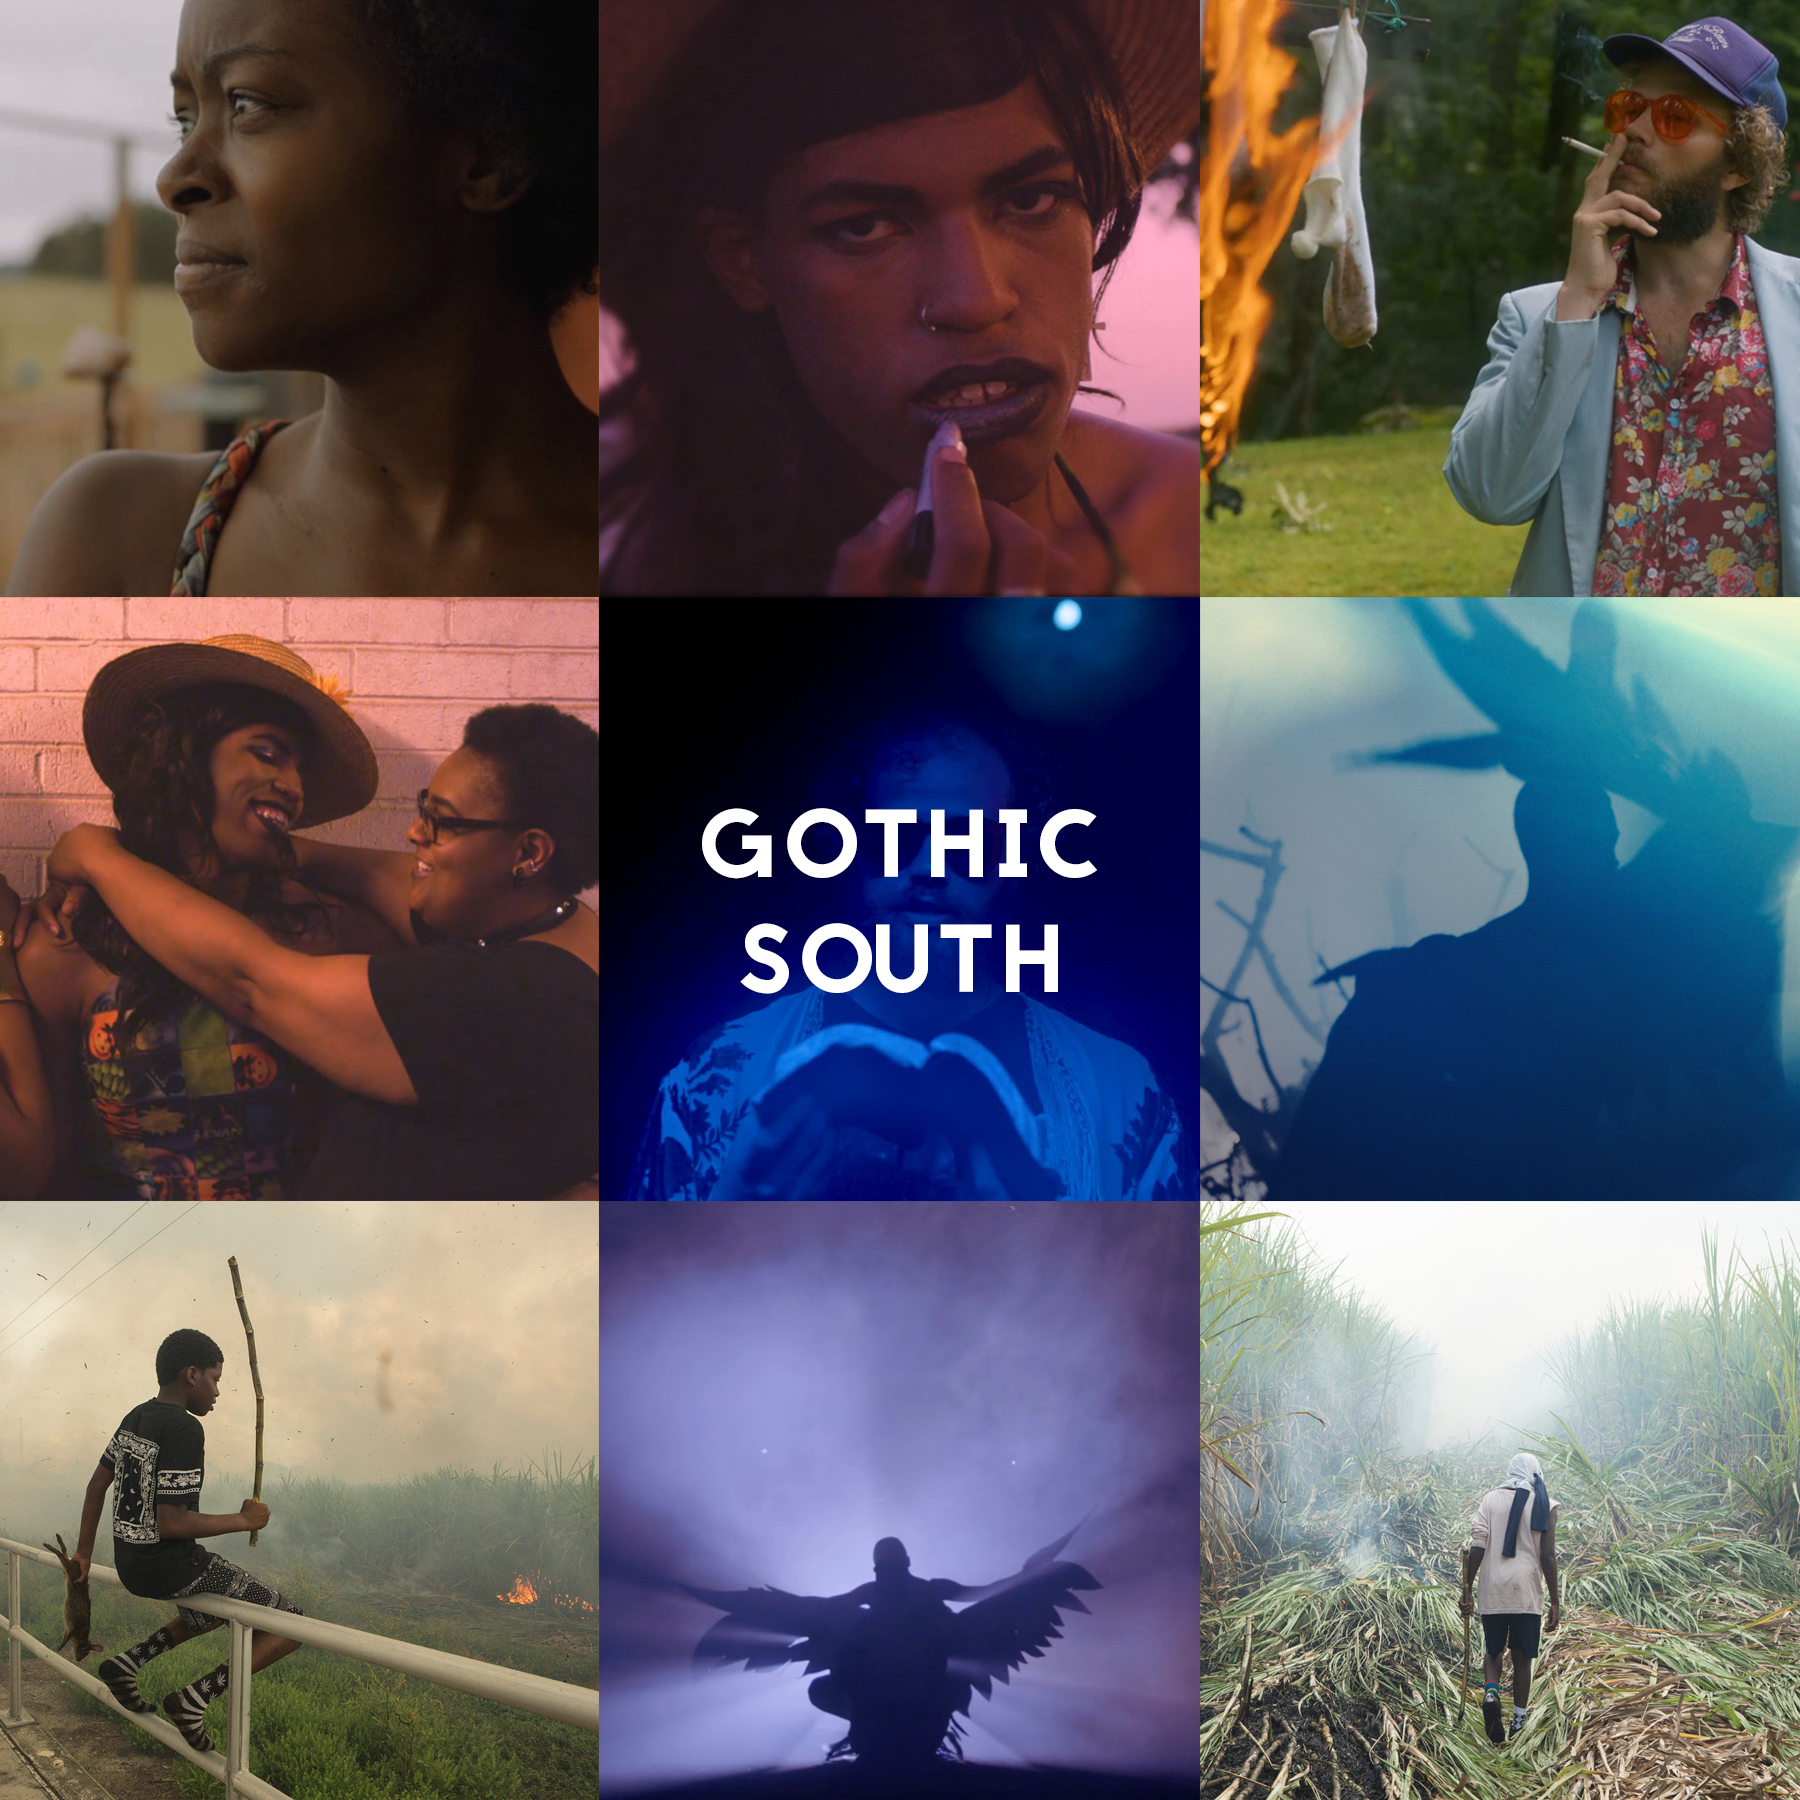 Gothic South - Sept 9, 2018